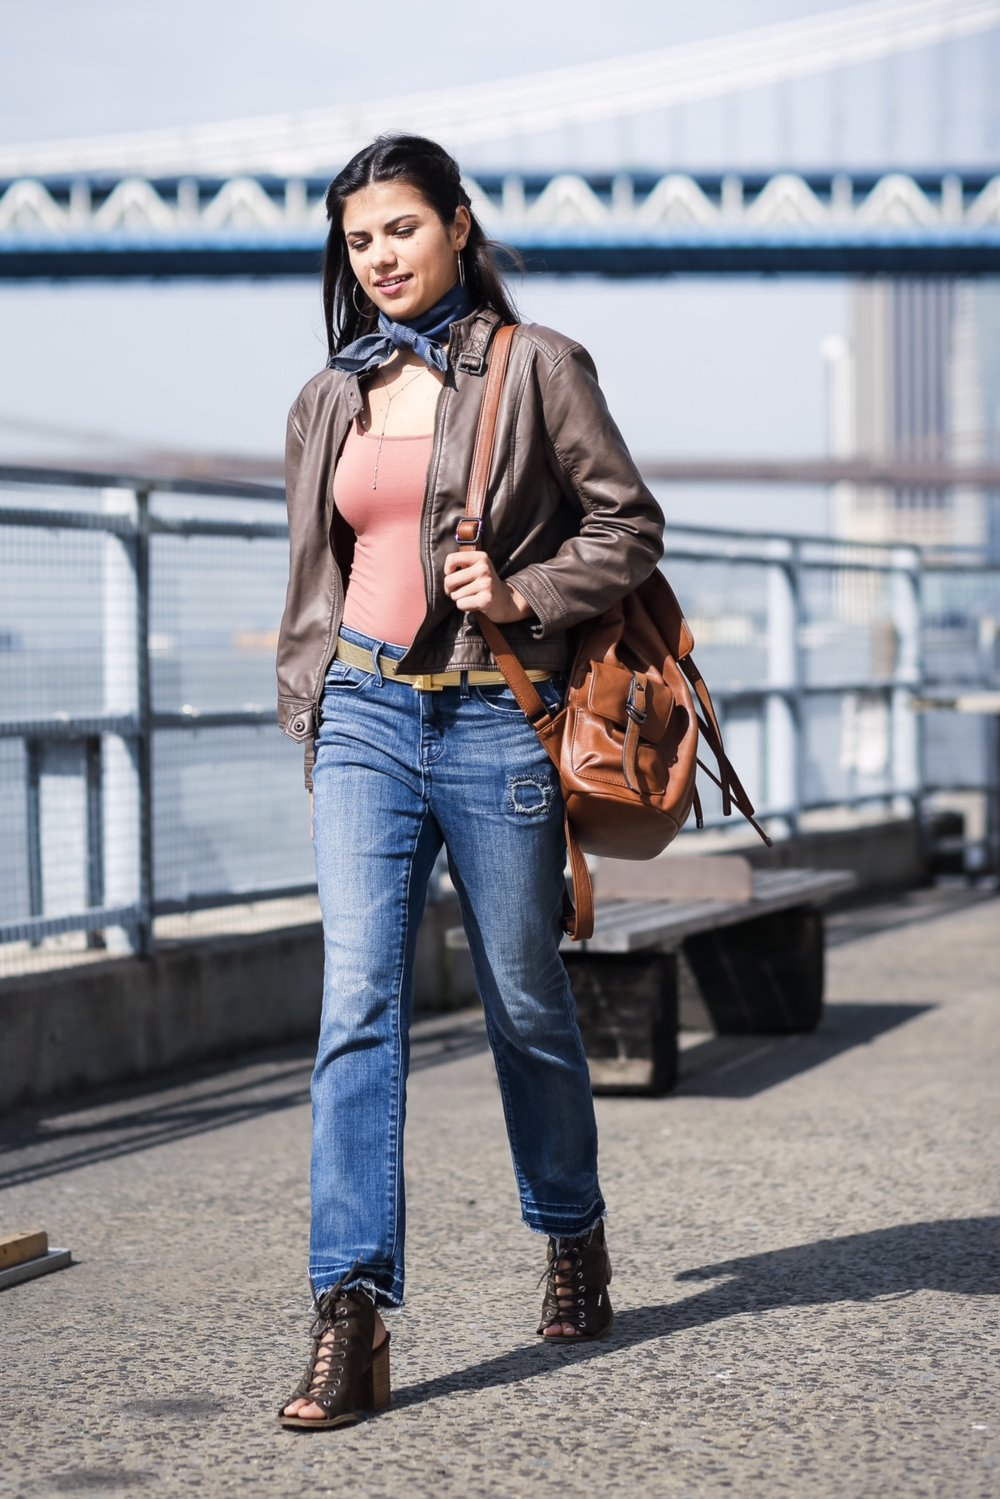 jeans / shoes  (similar)/ bodysuit /jacket (not available)